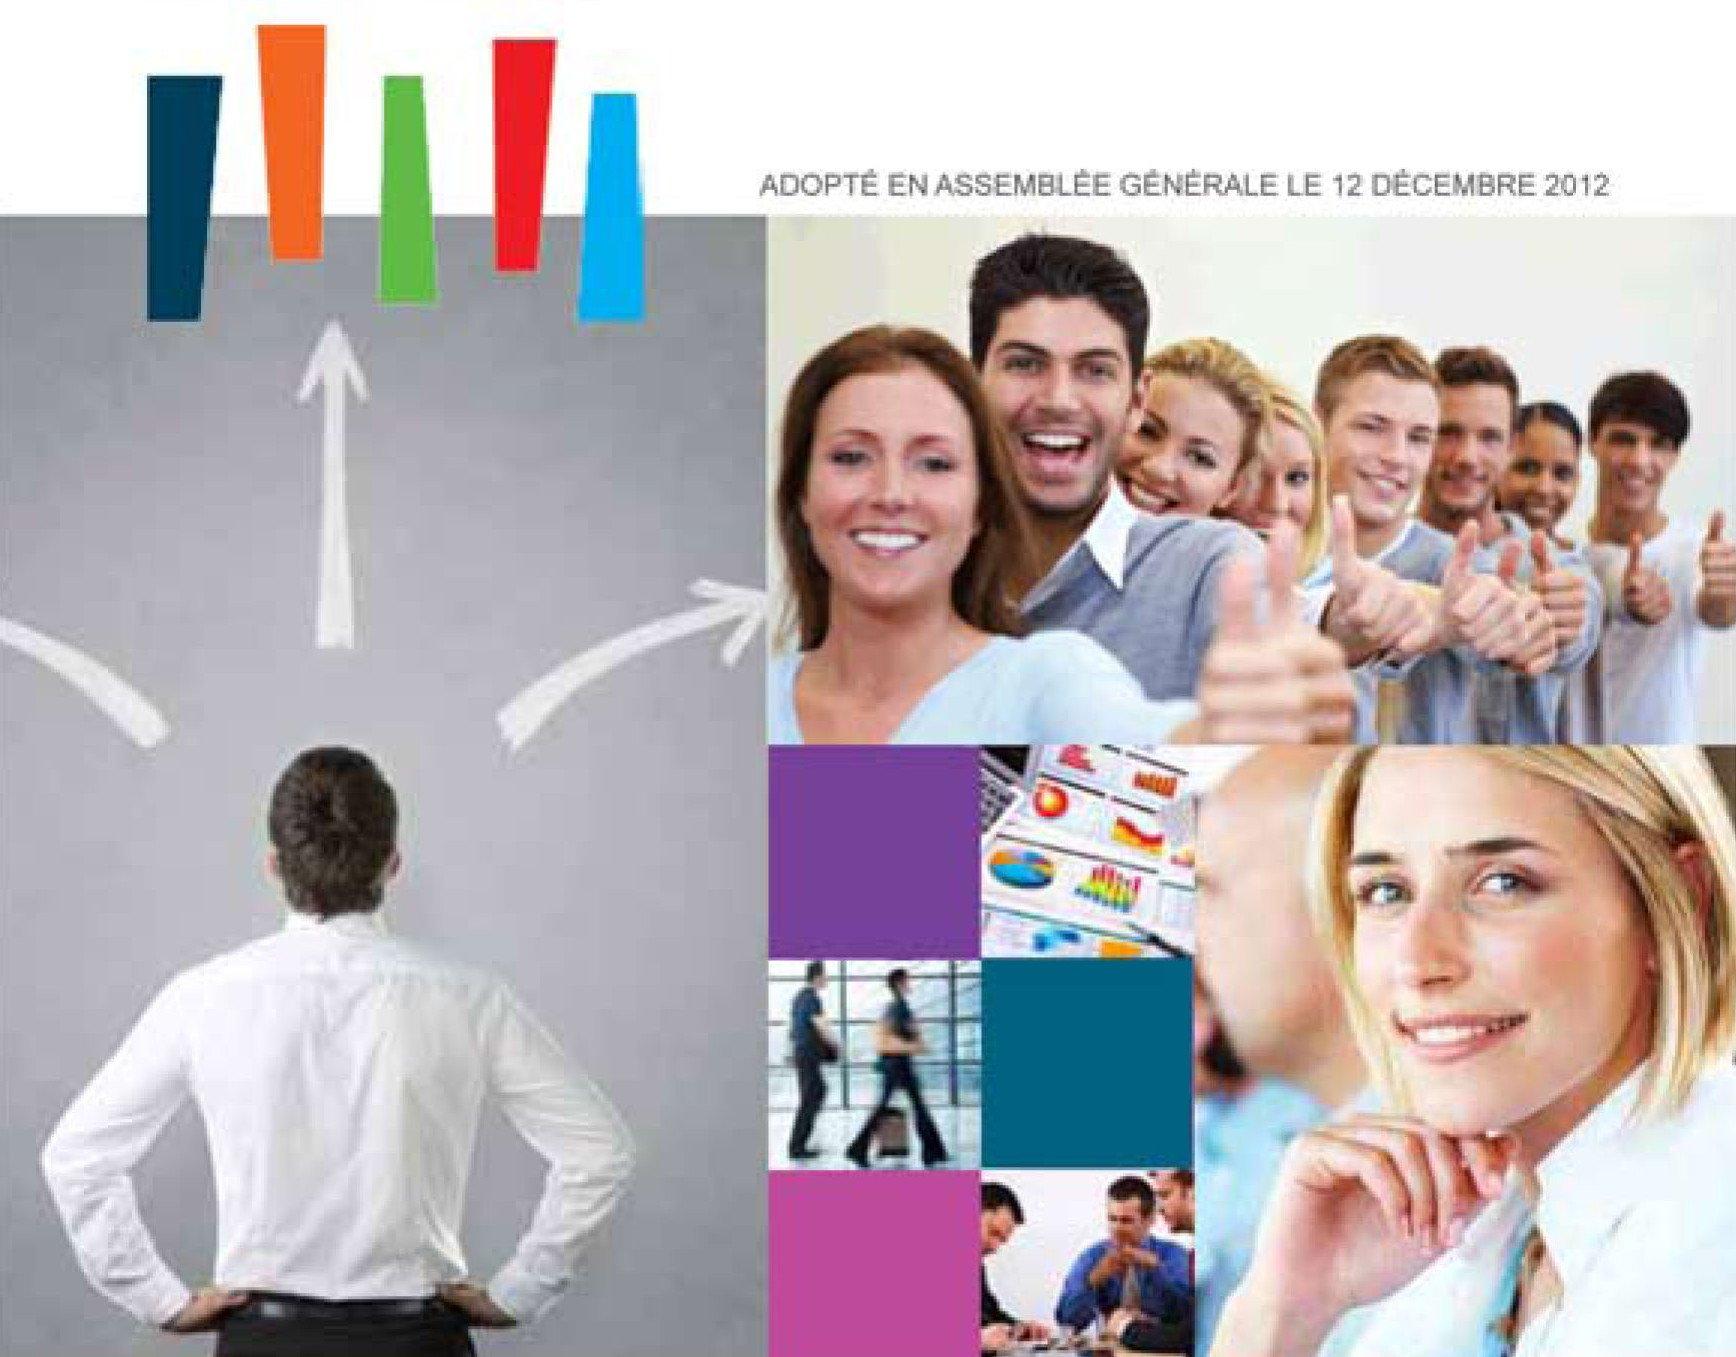 schema-sectoriel-formation-emploi-1-e1398872384929